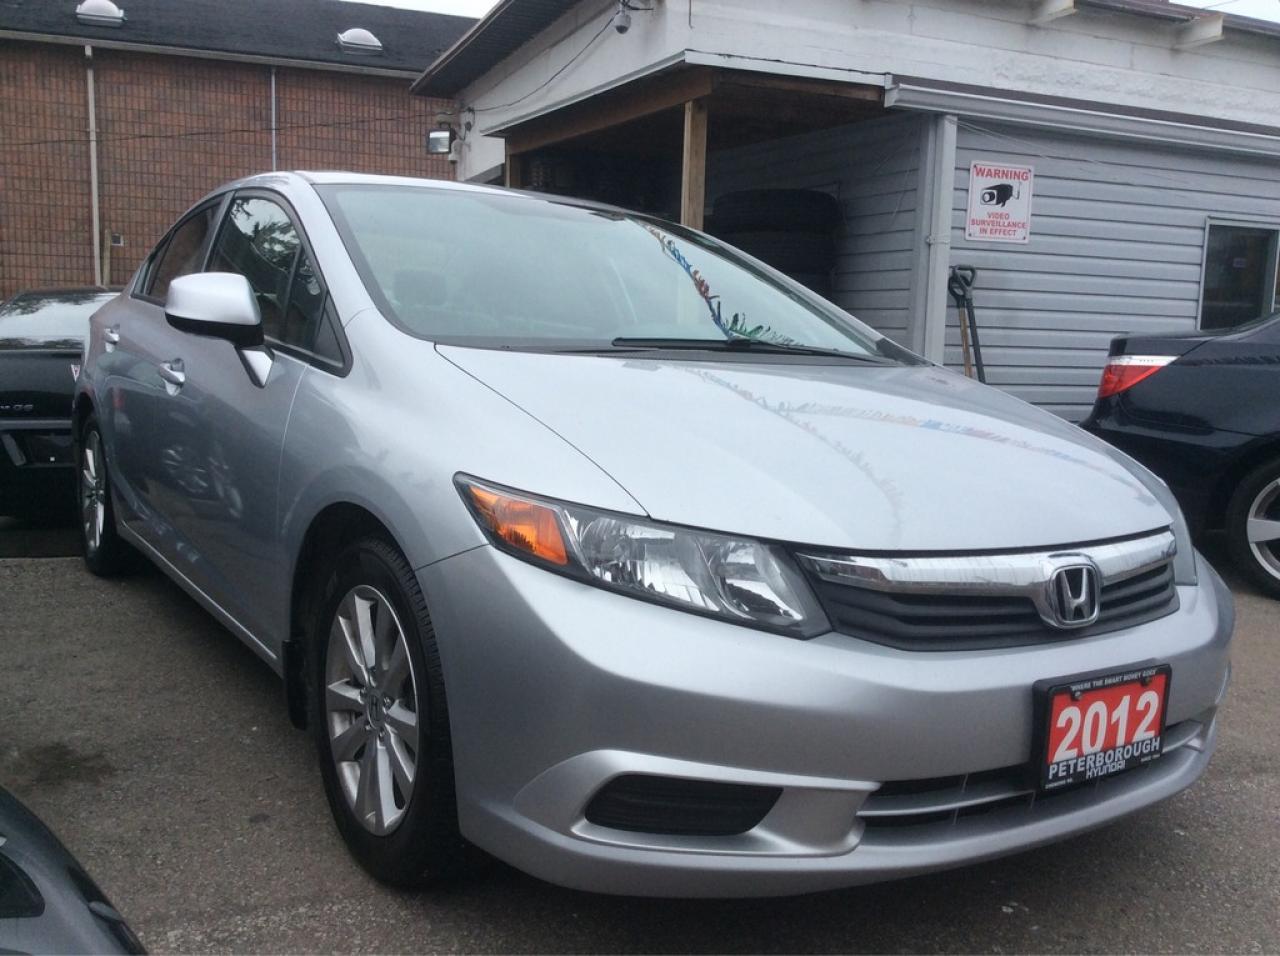 2012 Honda Civic Navigation Leather Sunroof Bluetooth Alloys